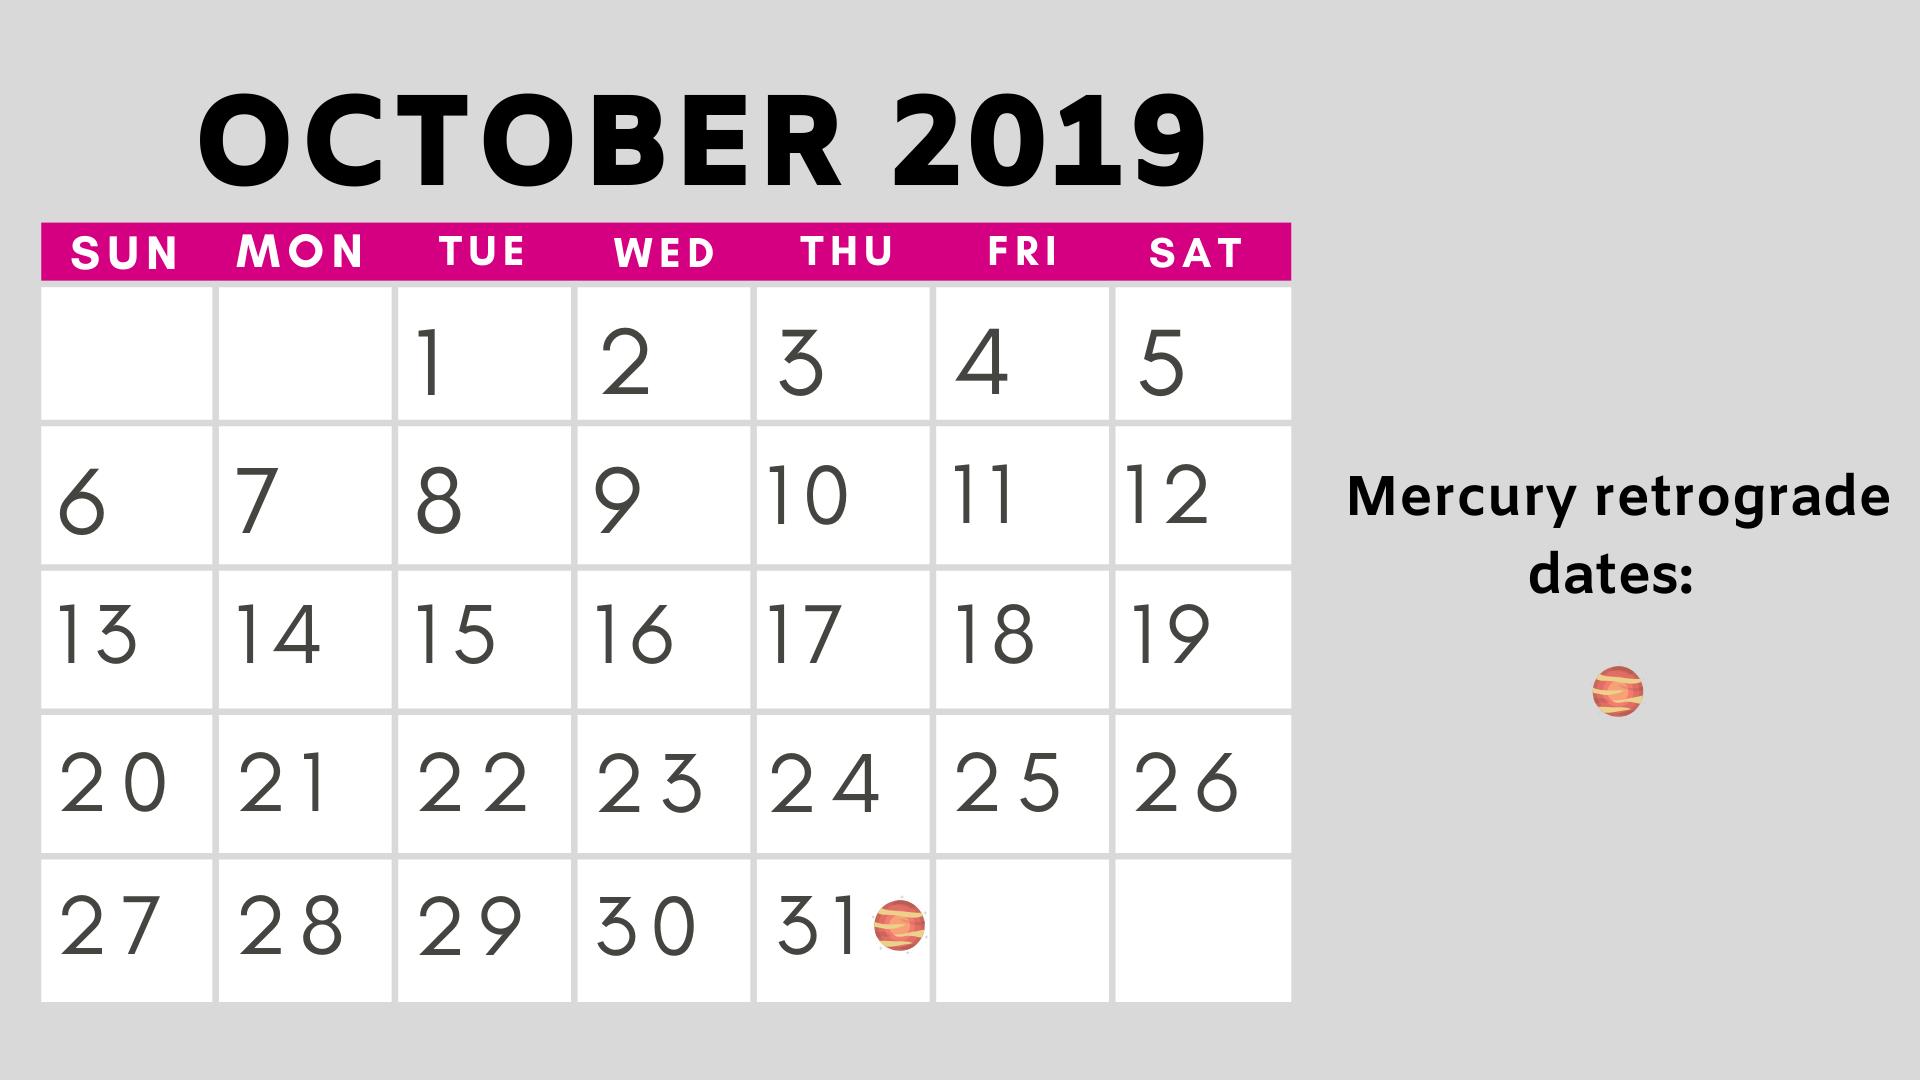 Mercury retrograde dates 2019